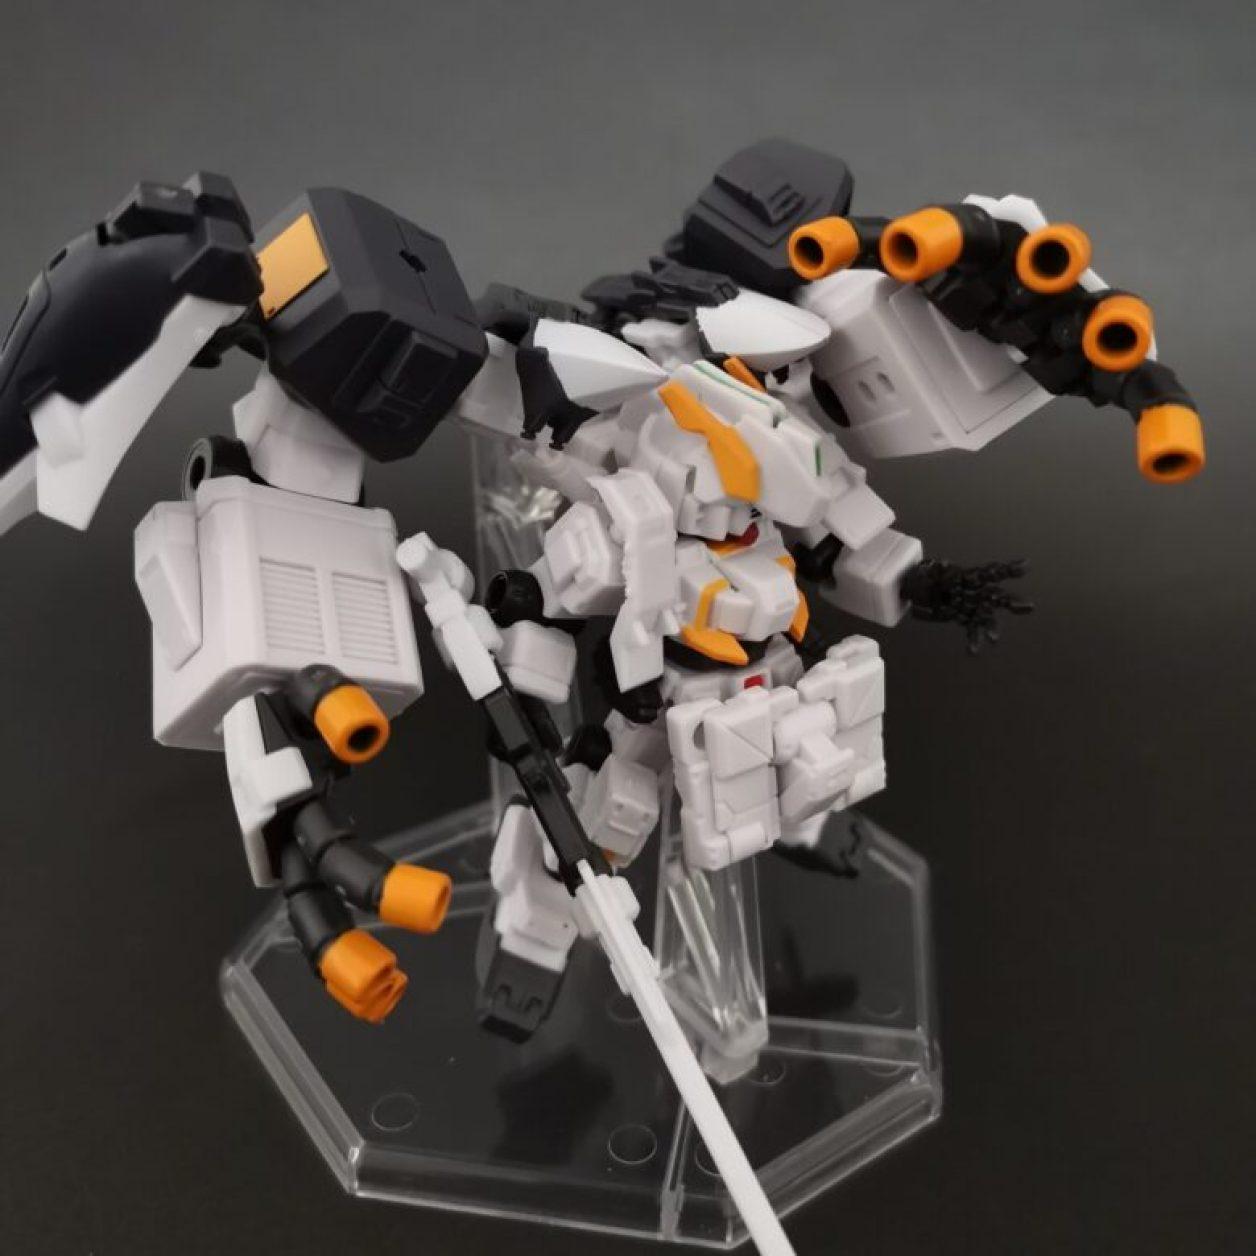 mobile suit ensemble (モビルスーツアンサンブル)ex23弾のガンダムtr-1[ヘイズル·アウスラ](ギガンティックアームユニット装備)の完成画像